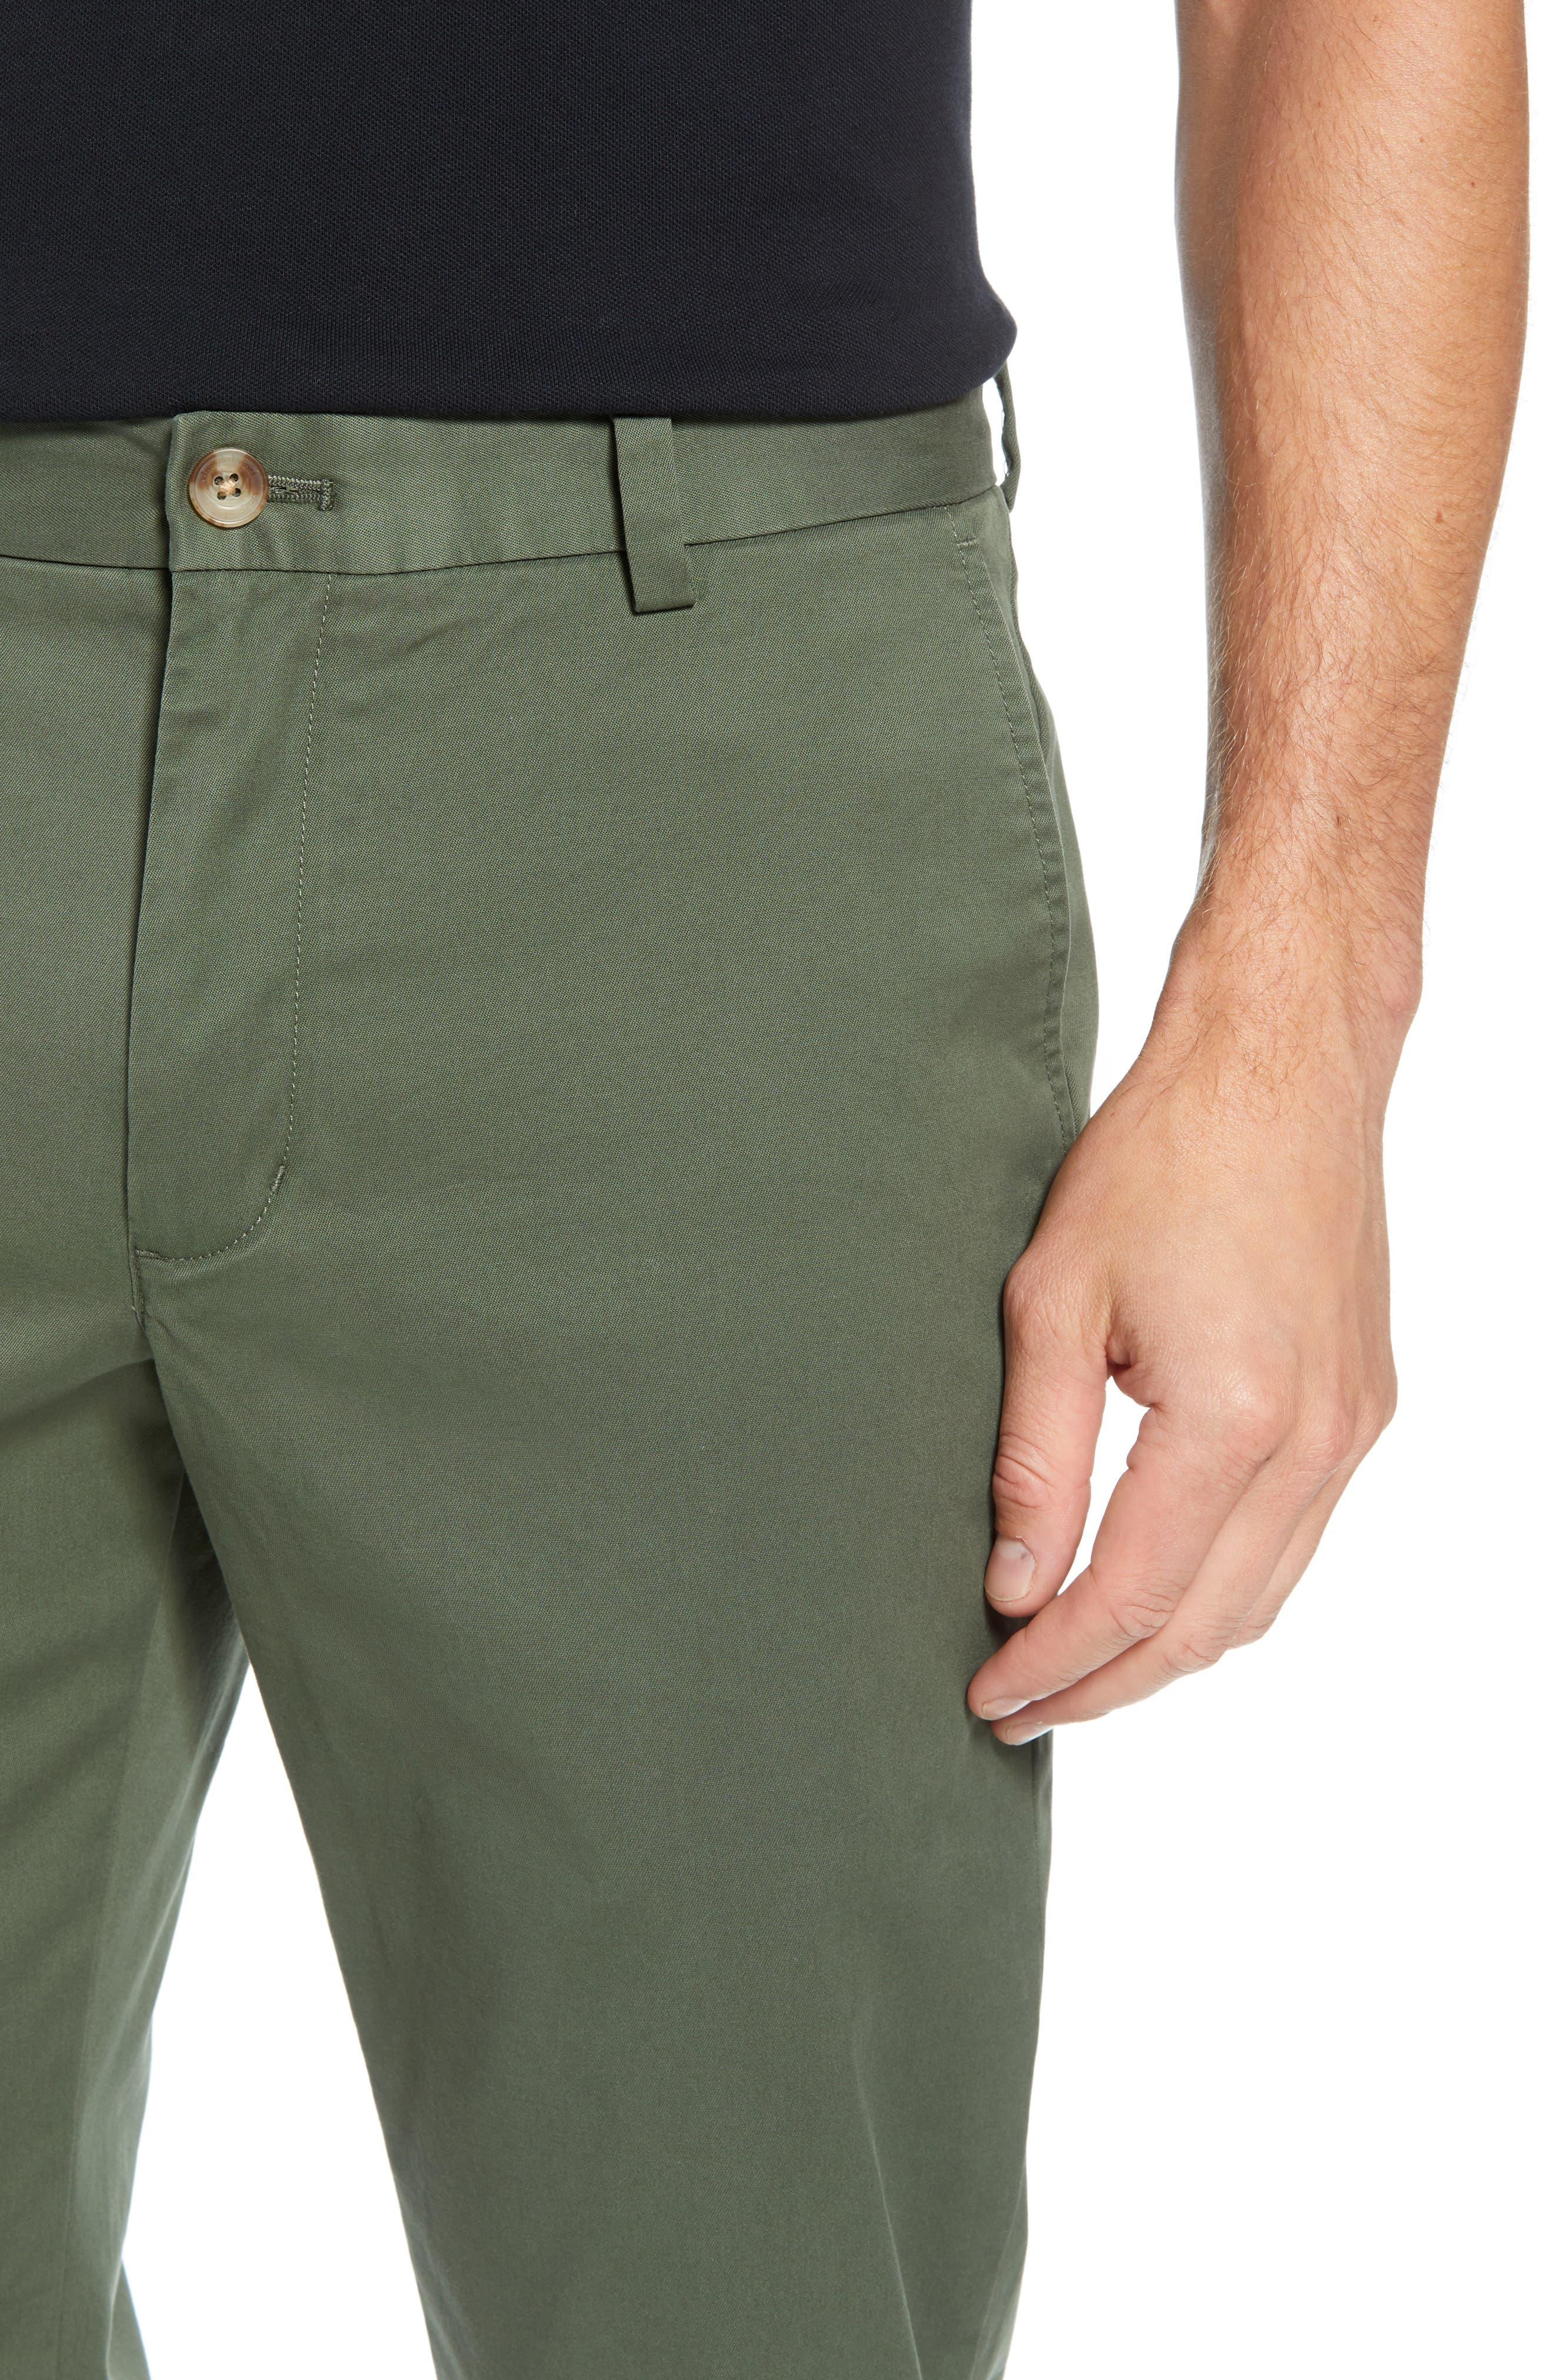 VINEYARD VINES, Breaker Flat Front Stretch Cotton Pants, Alternate thumbnail 5, color, CARGO GREEN